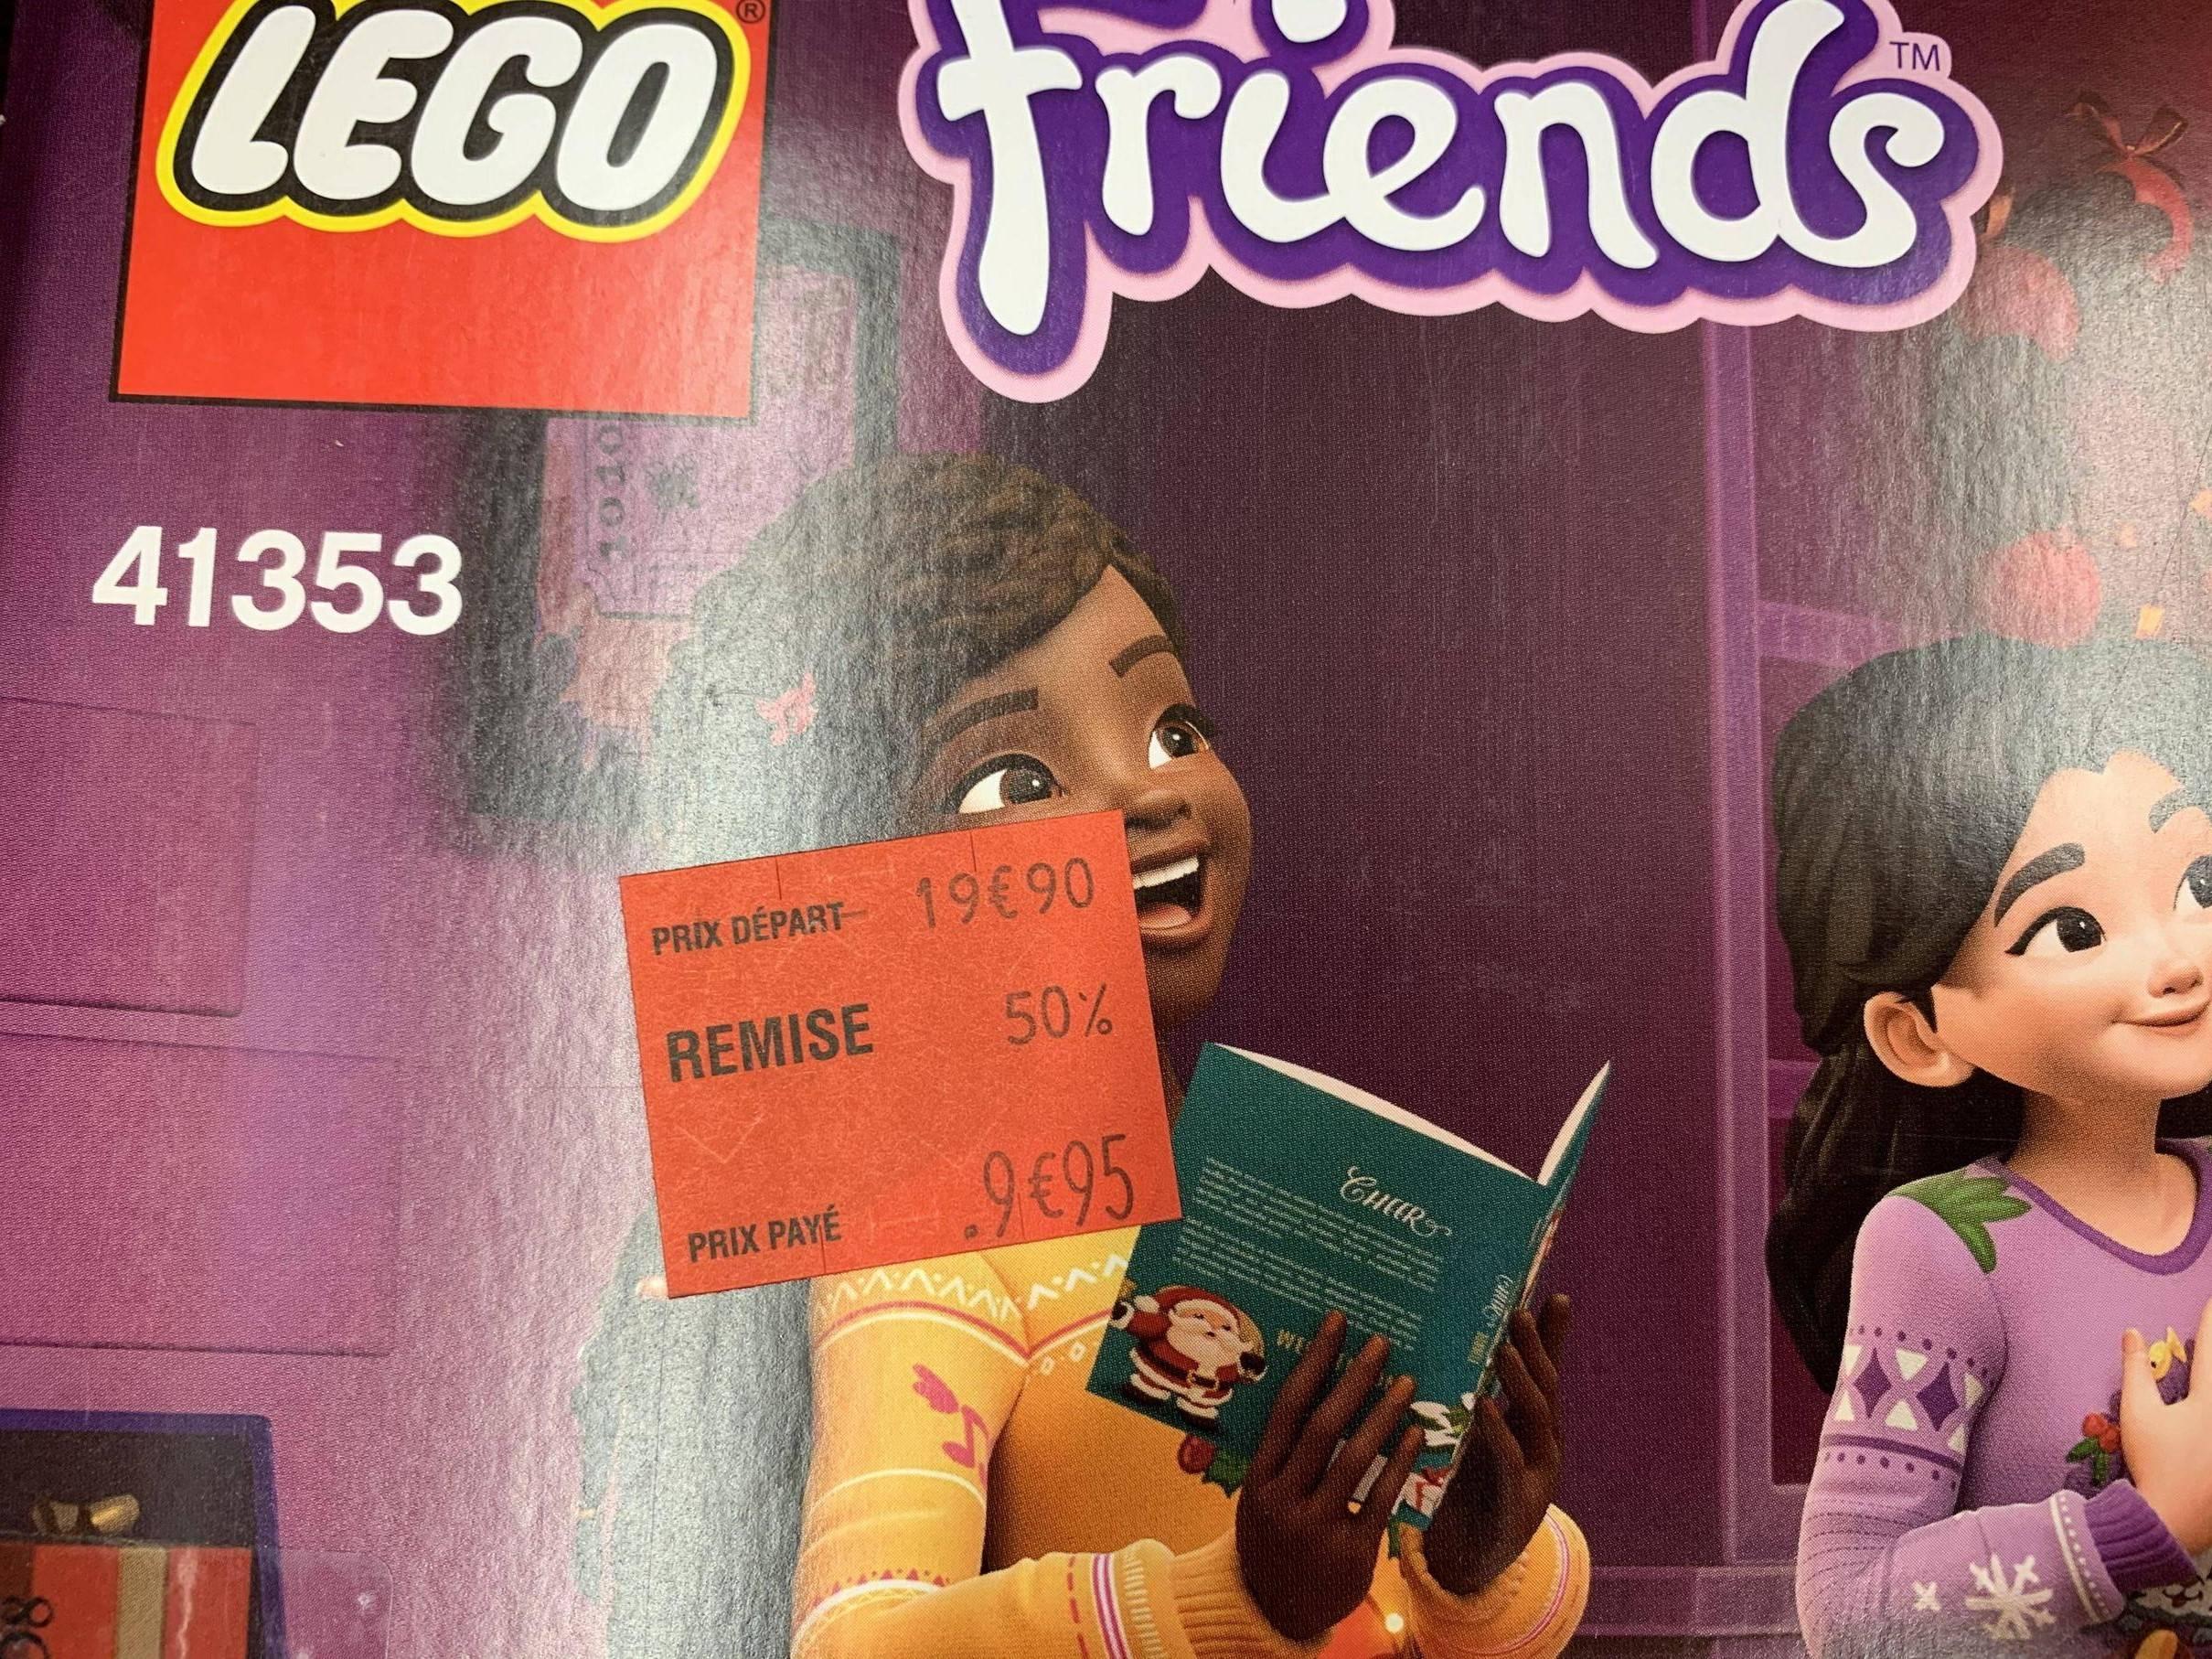 Calendrier De L Avent Lego Star Wars Carrefour.Calendrier De L Avent Lego Friend S 41353 Carrefour